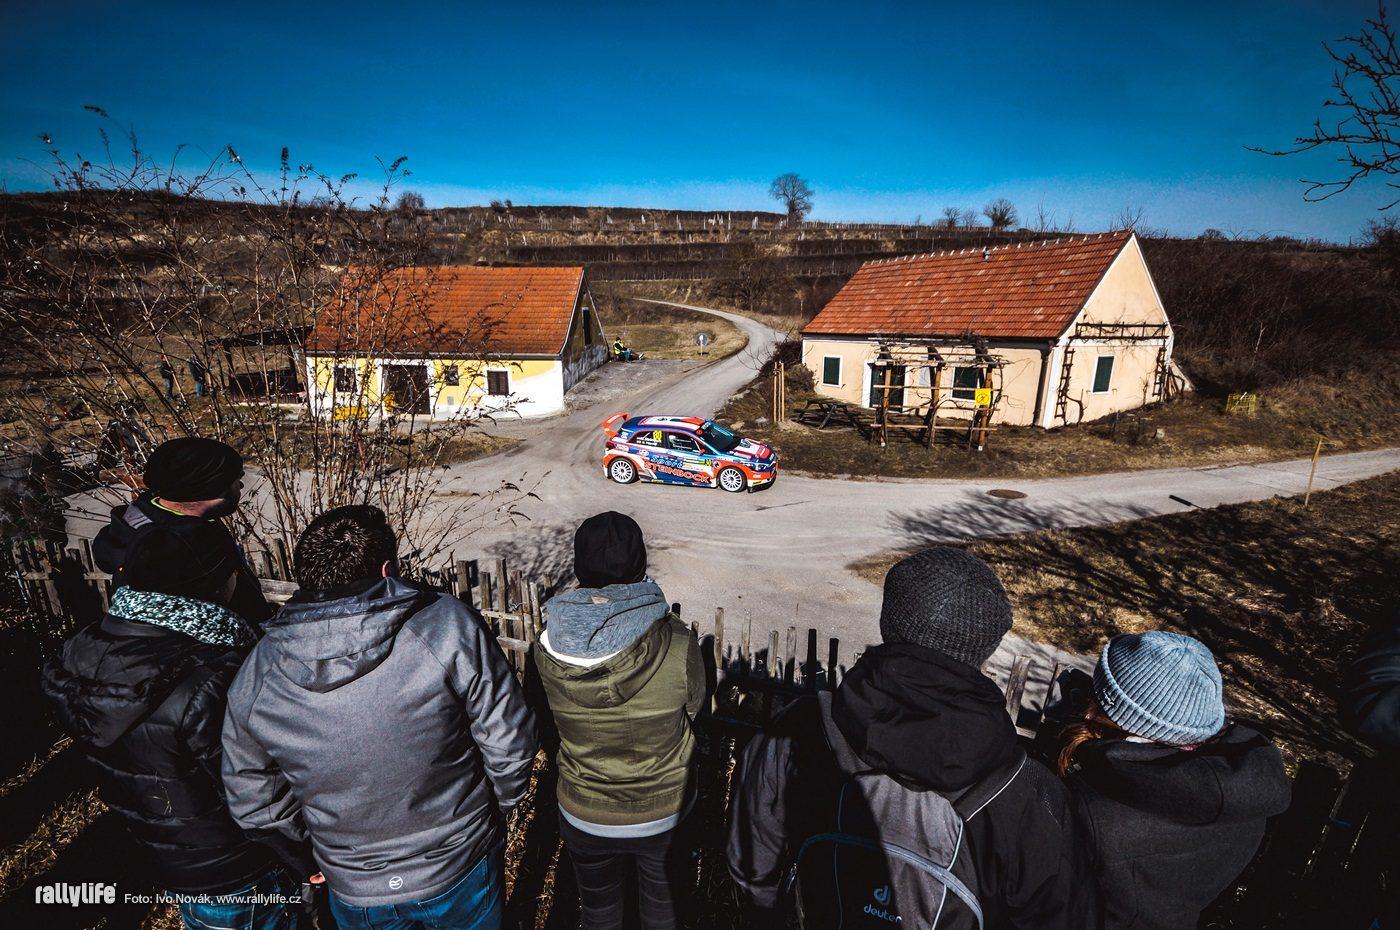 Schneerosen rallye 2019